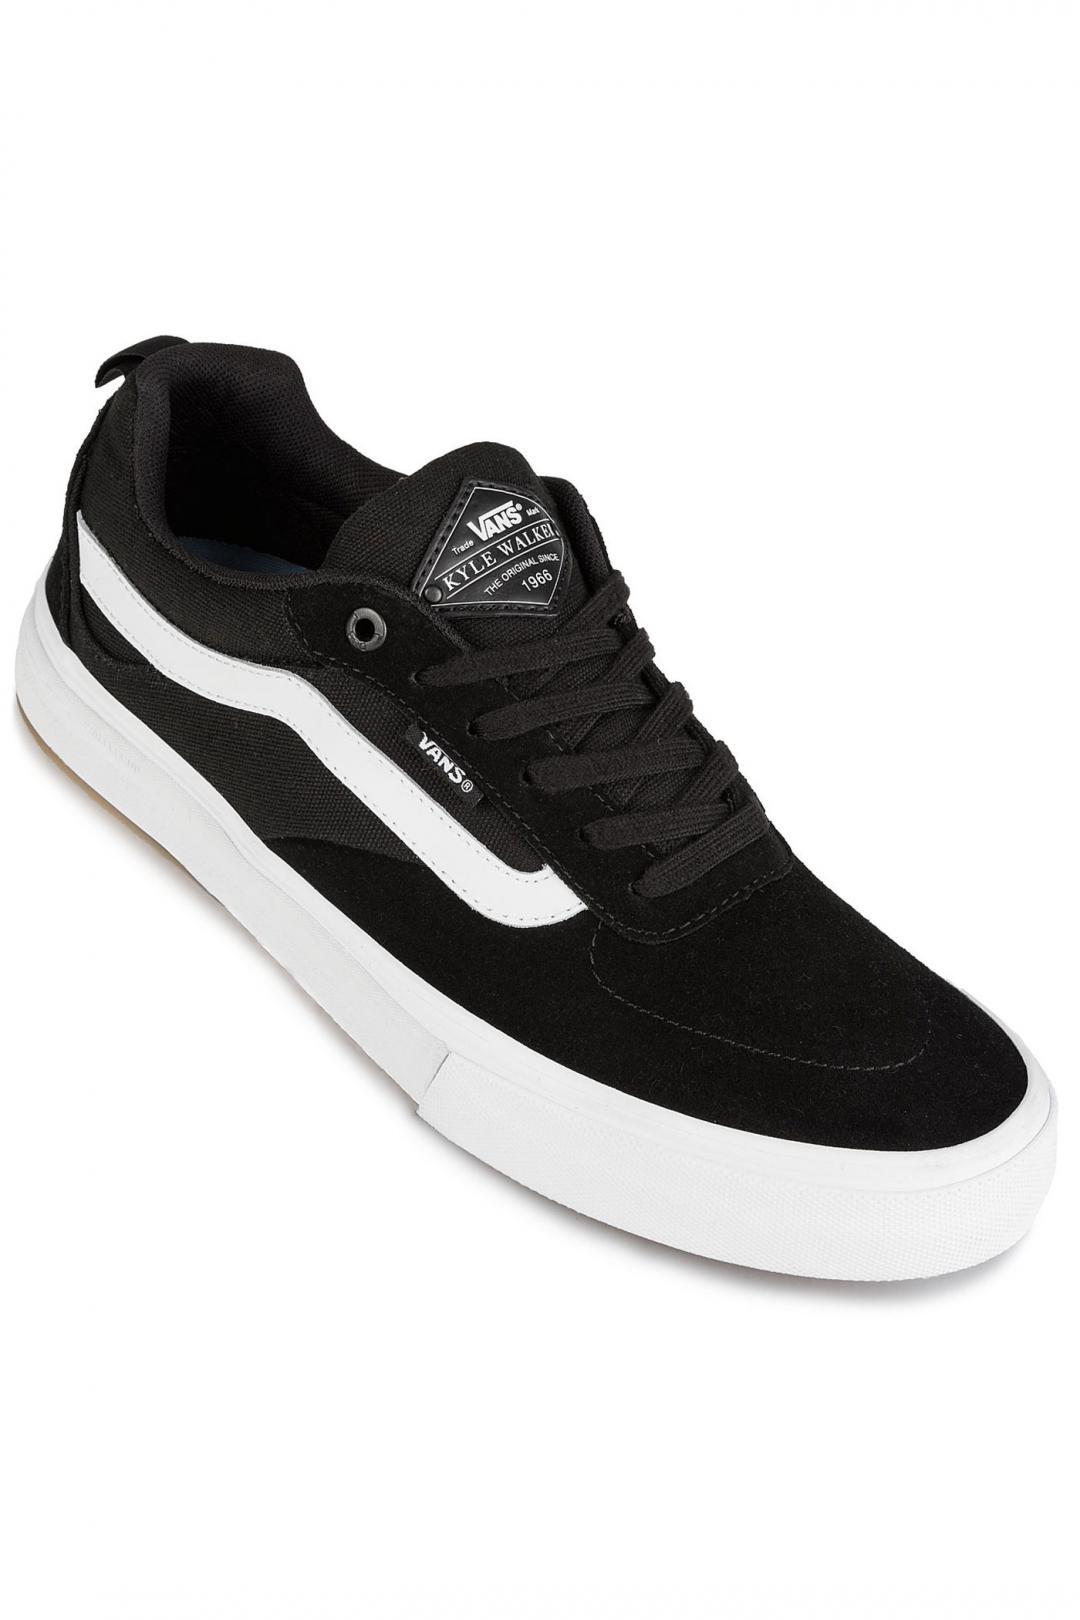 Uomo Vans Kyle Walker Pro black white | Sneaker